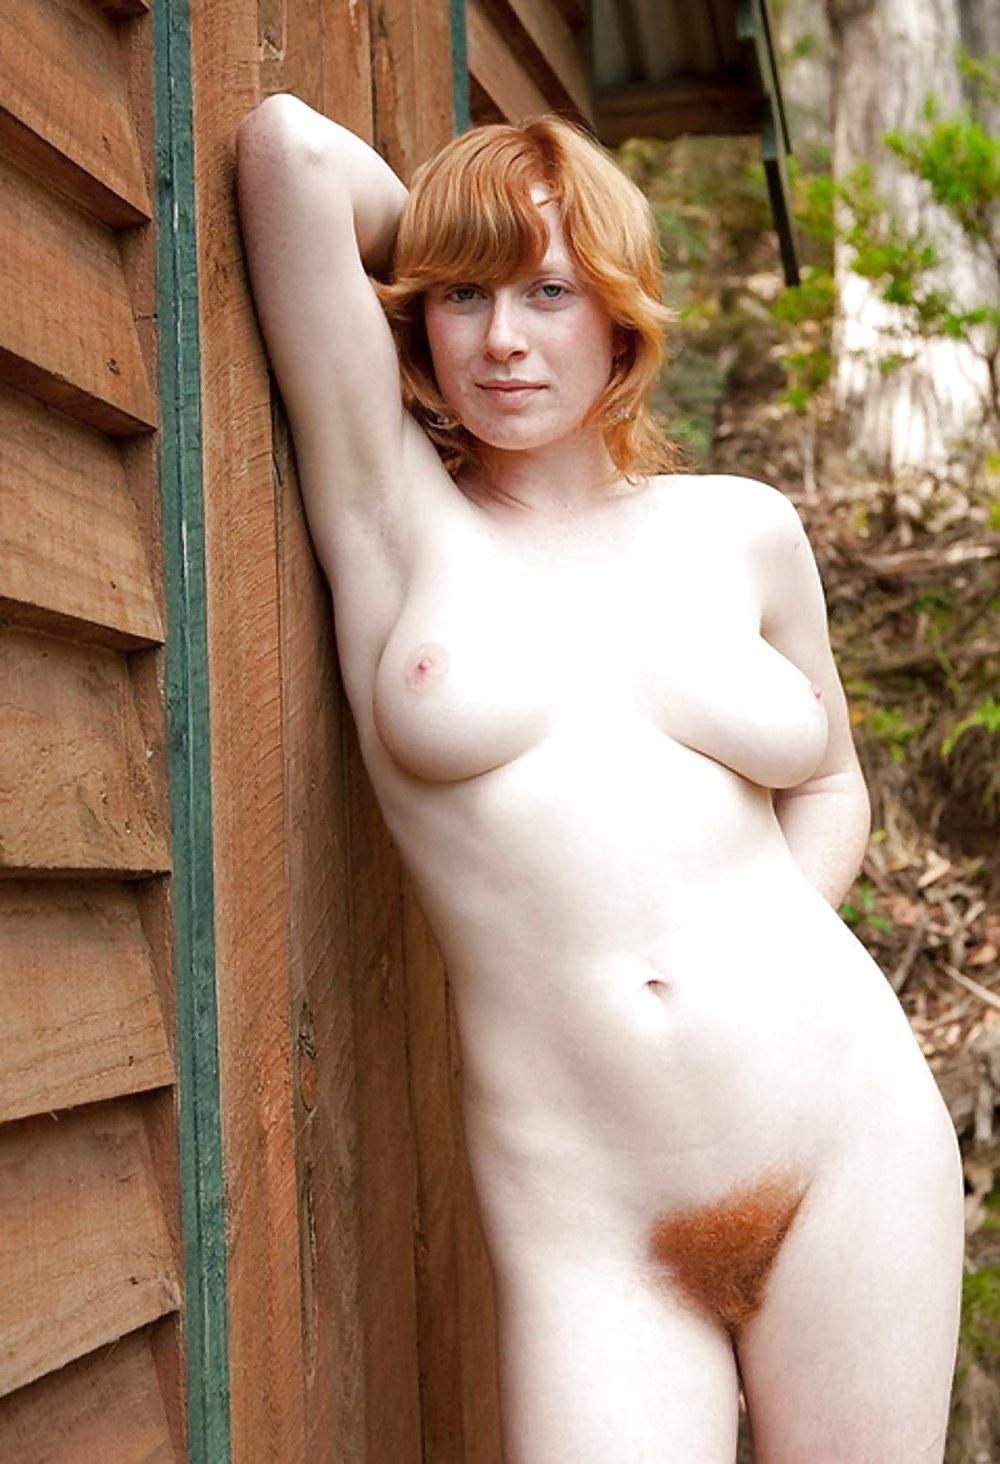 Hairy pussy big tits tube